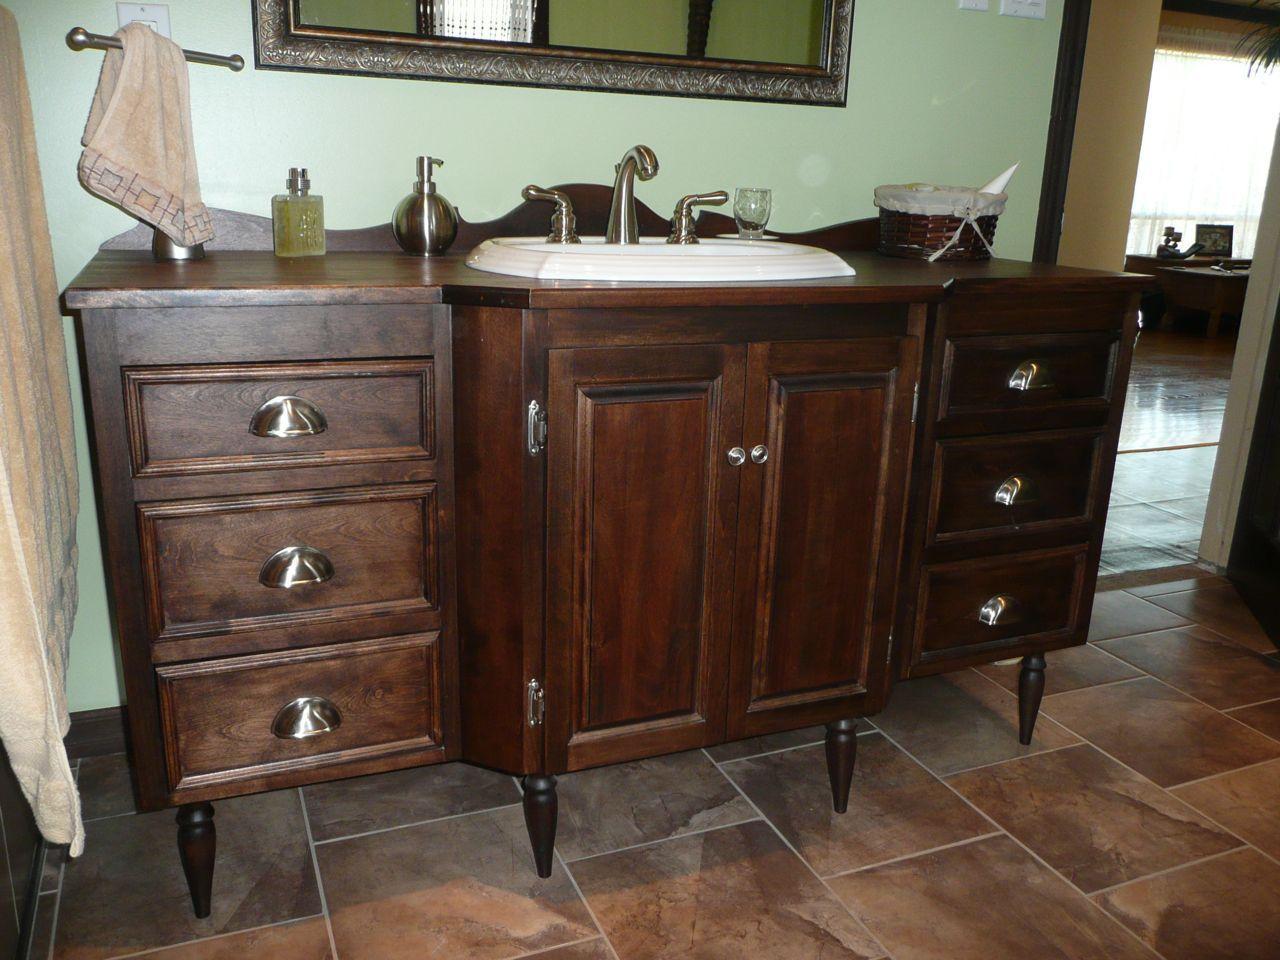 vanit de salle de bain. Black Bedroom Furniture Sets. Home Design Ideas